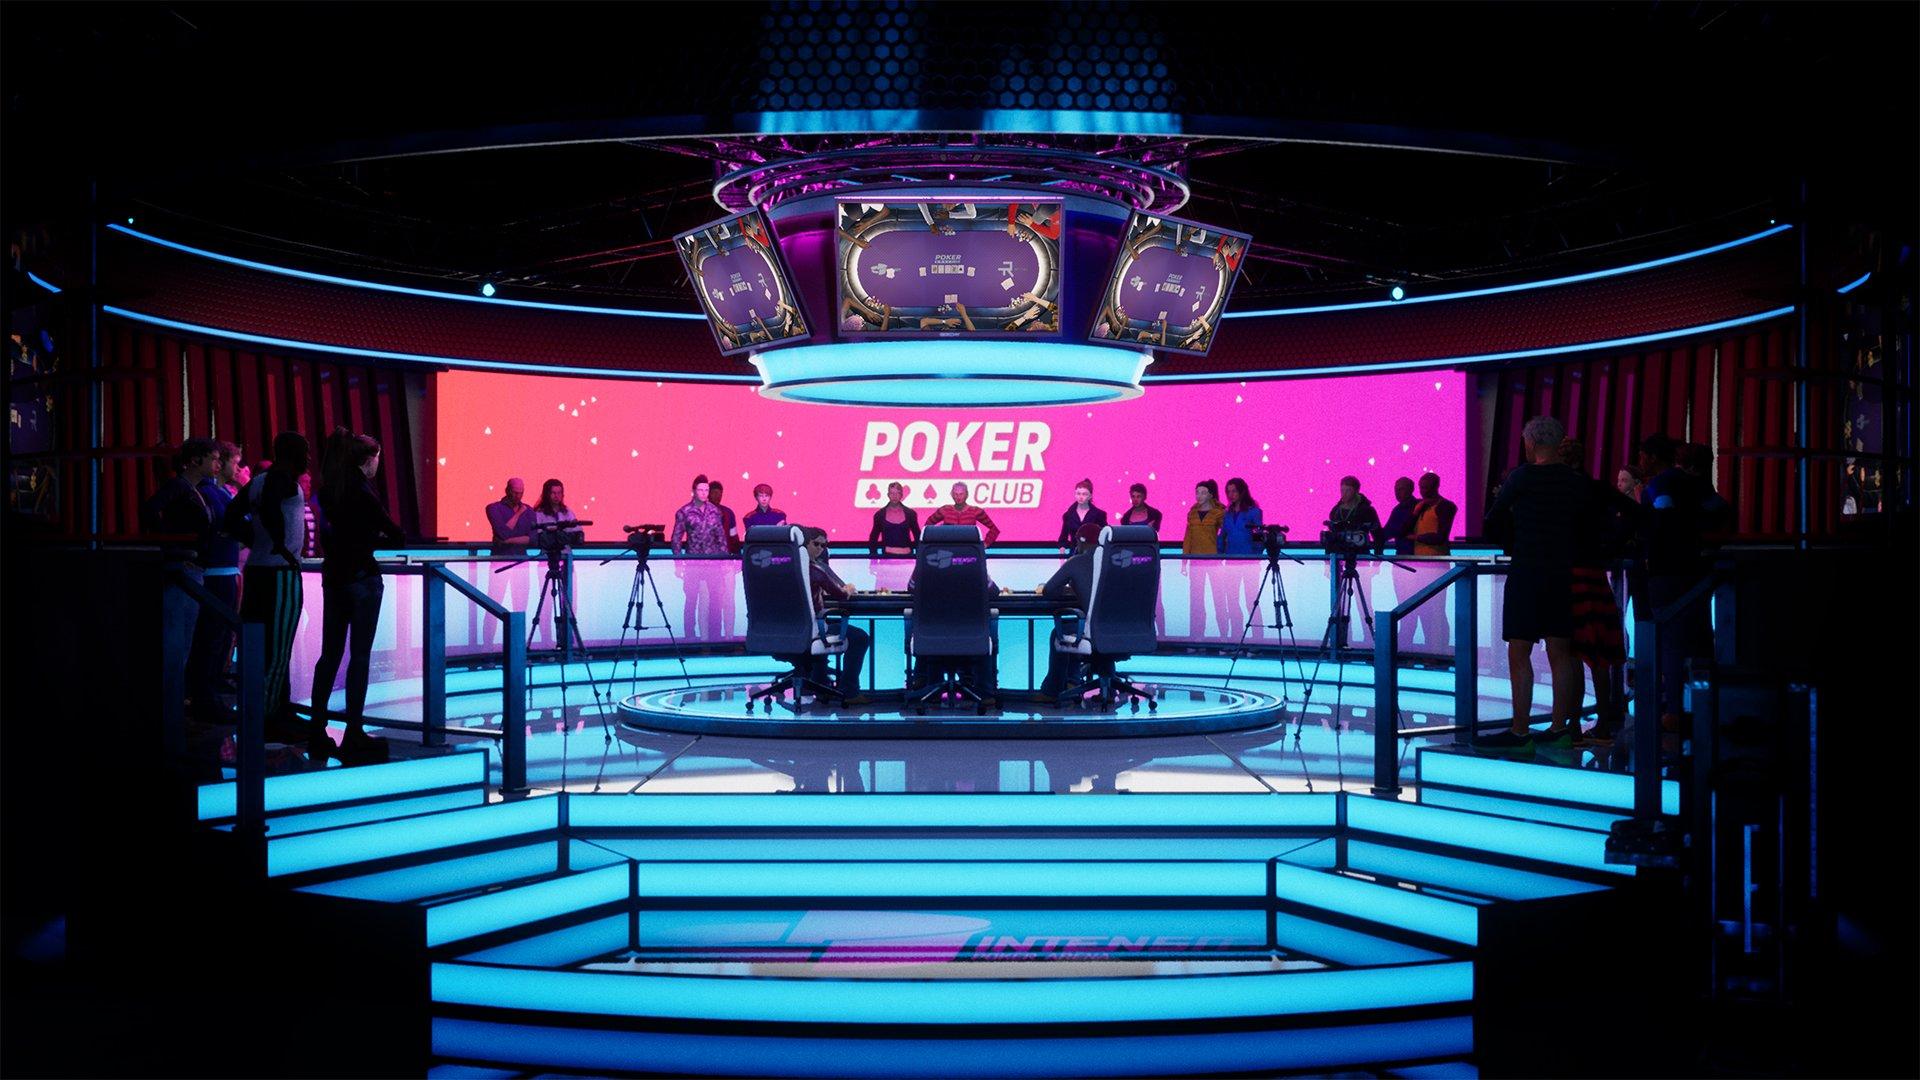 poker club game wallpaper 72505